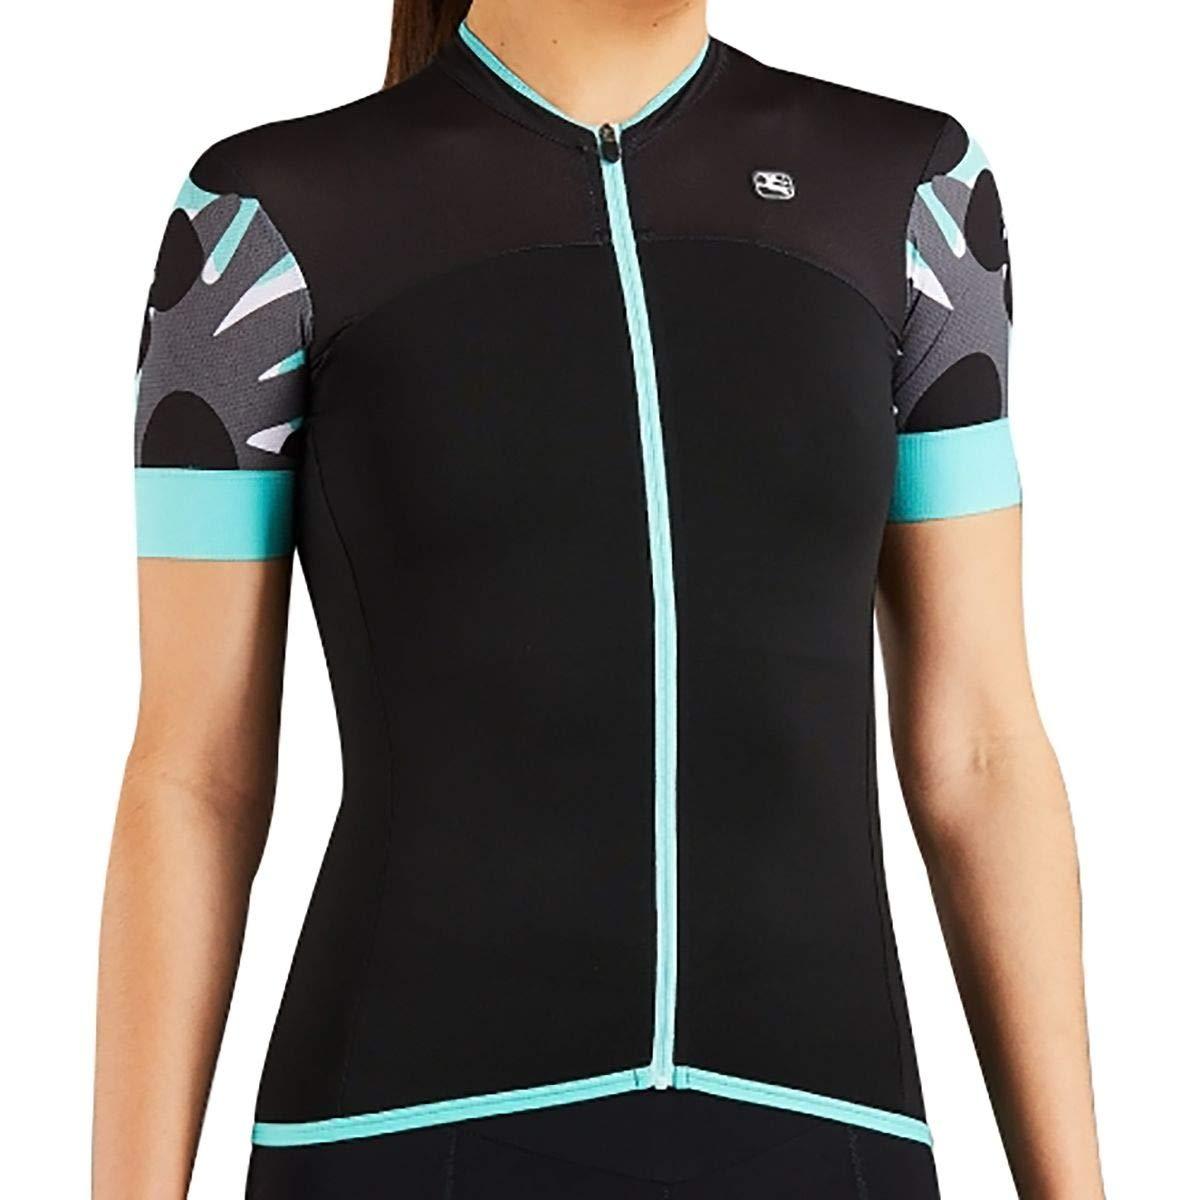 Giordana Lungo Short-Sleeve Jersey - Women's Black/Mint/Grey, XS